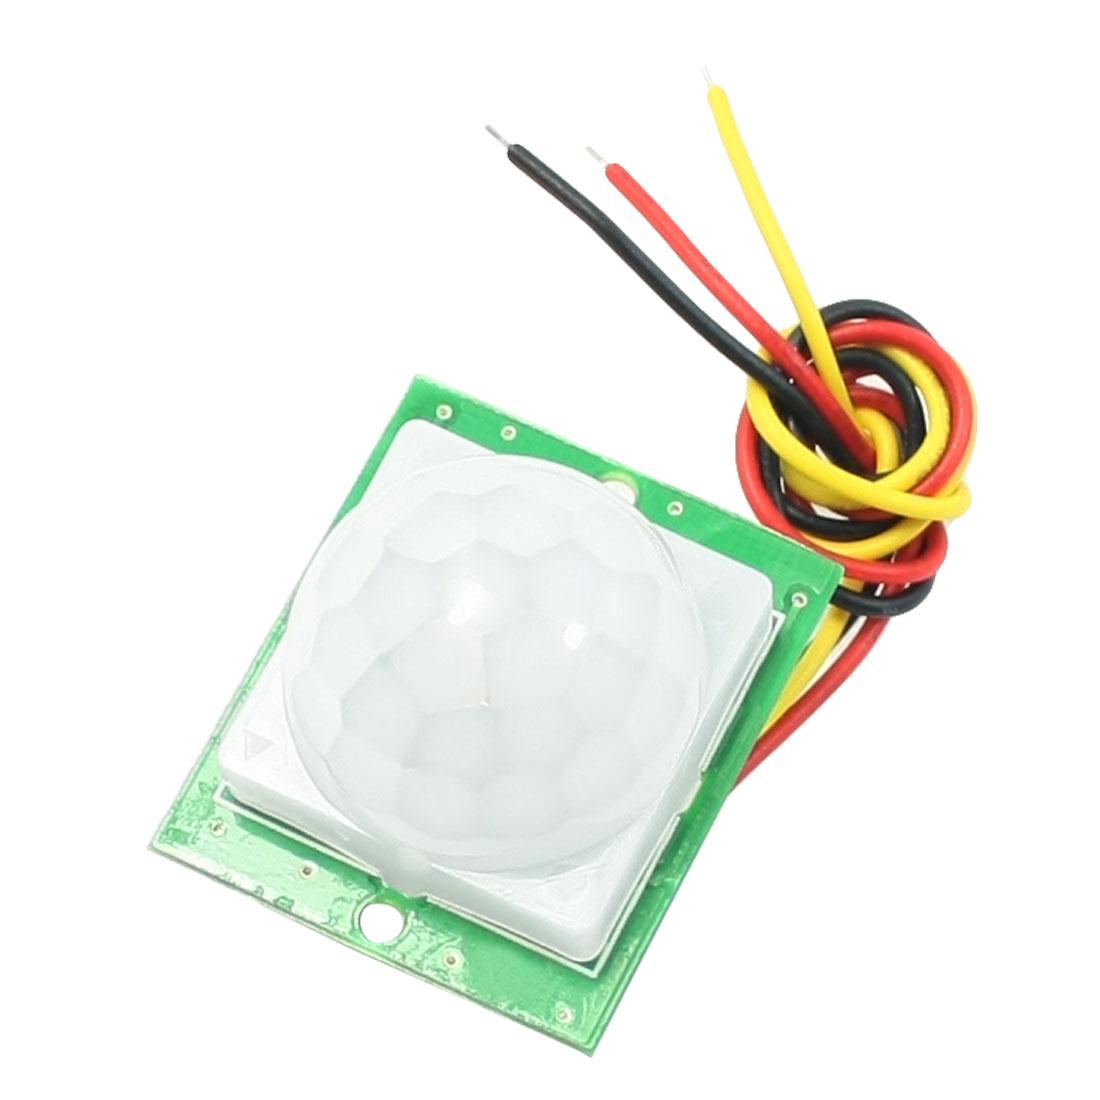 5-24VDC TDL-718A Model Temperature Sensor Module for Automatic Light